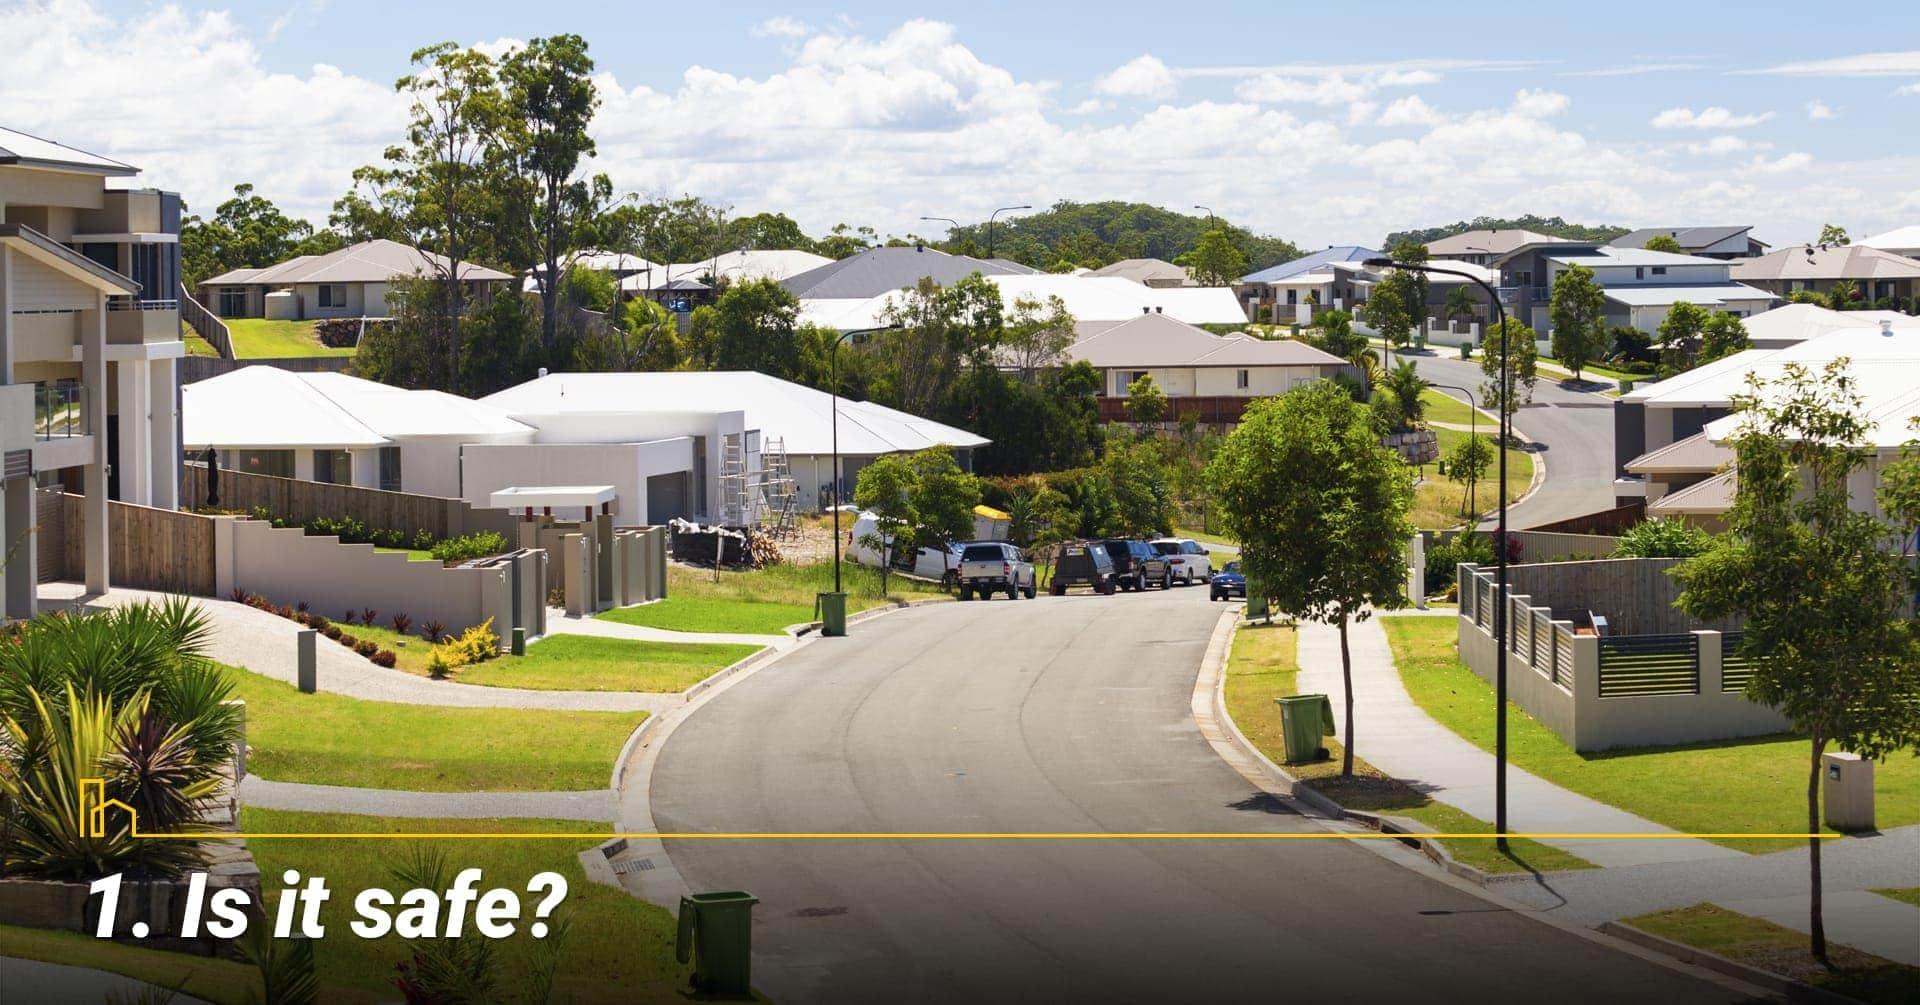 Is it safe? Choose a safe neighborhood